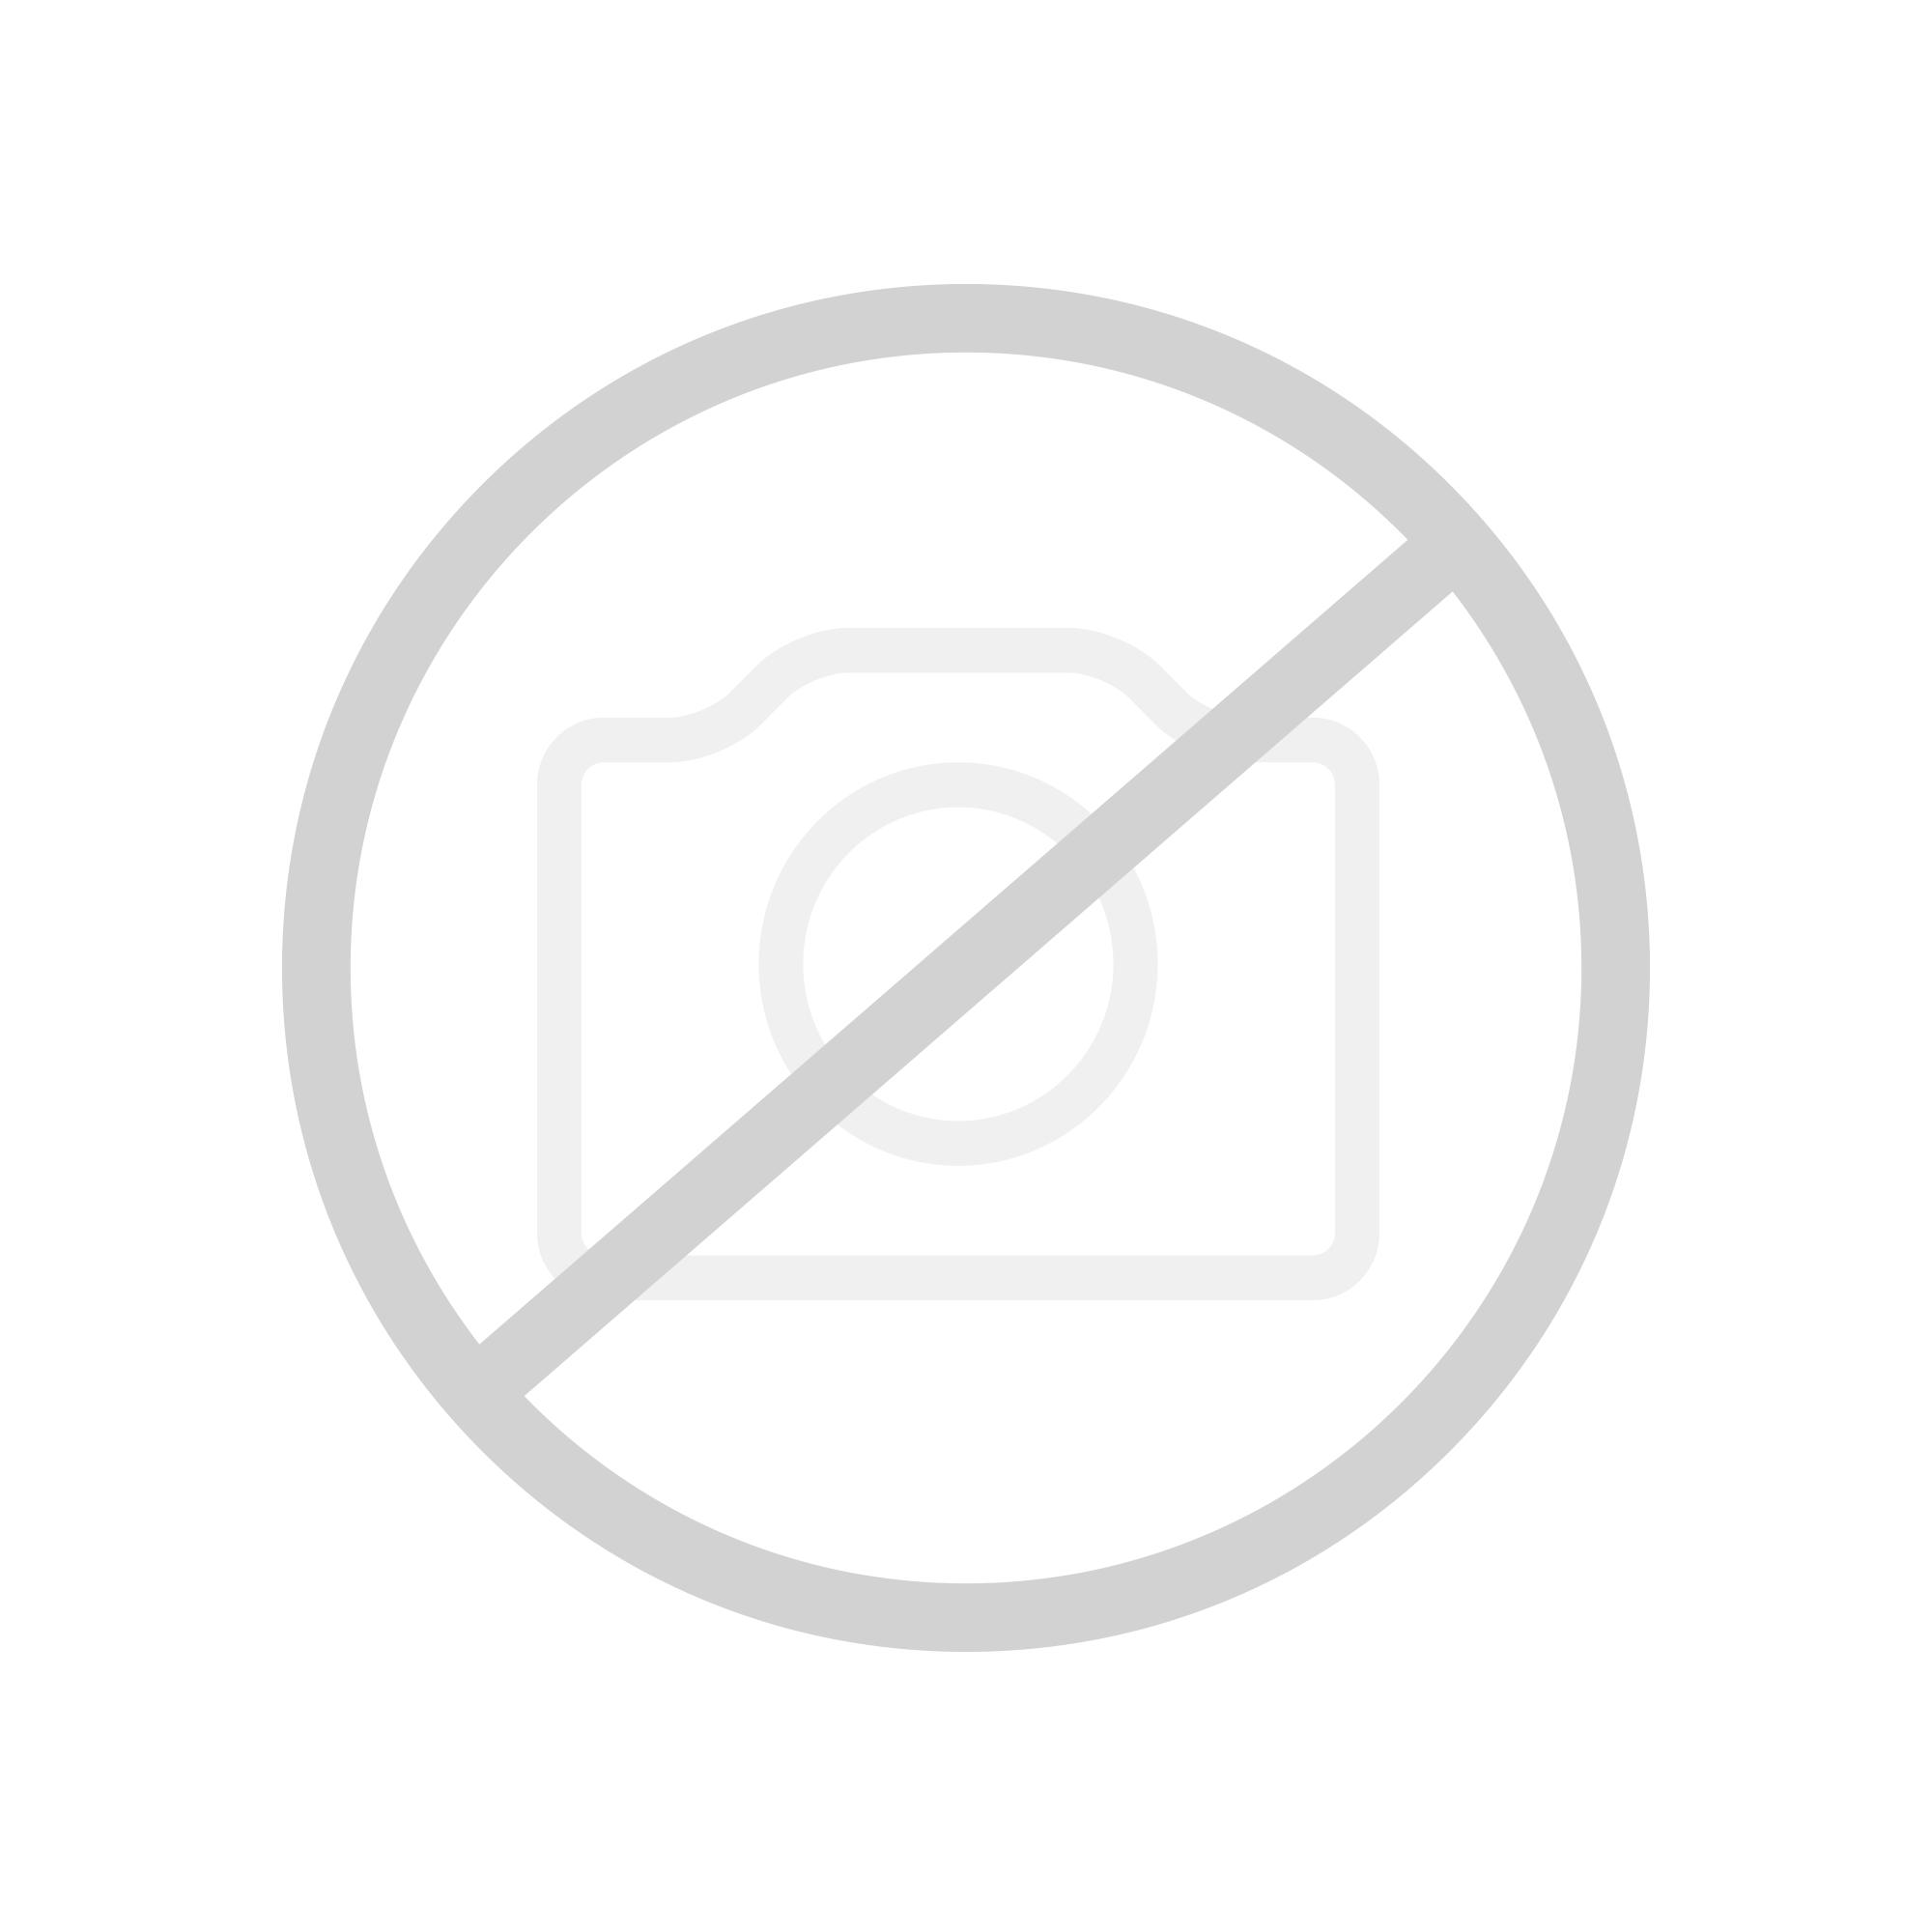 duravit starck 1 wc sitz mit absenkautomatik soft close 0065880099 reuter. Black Bedroom Furniture Sets. Home Design Ideas